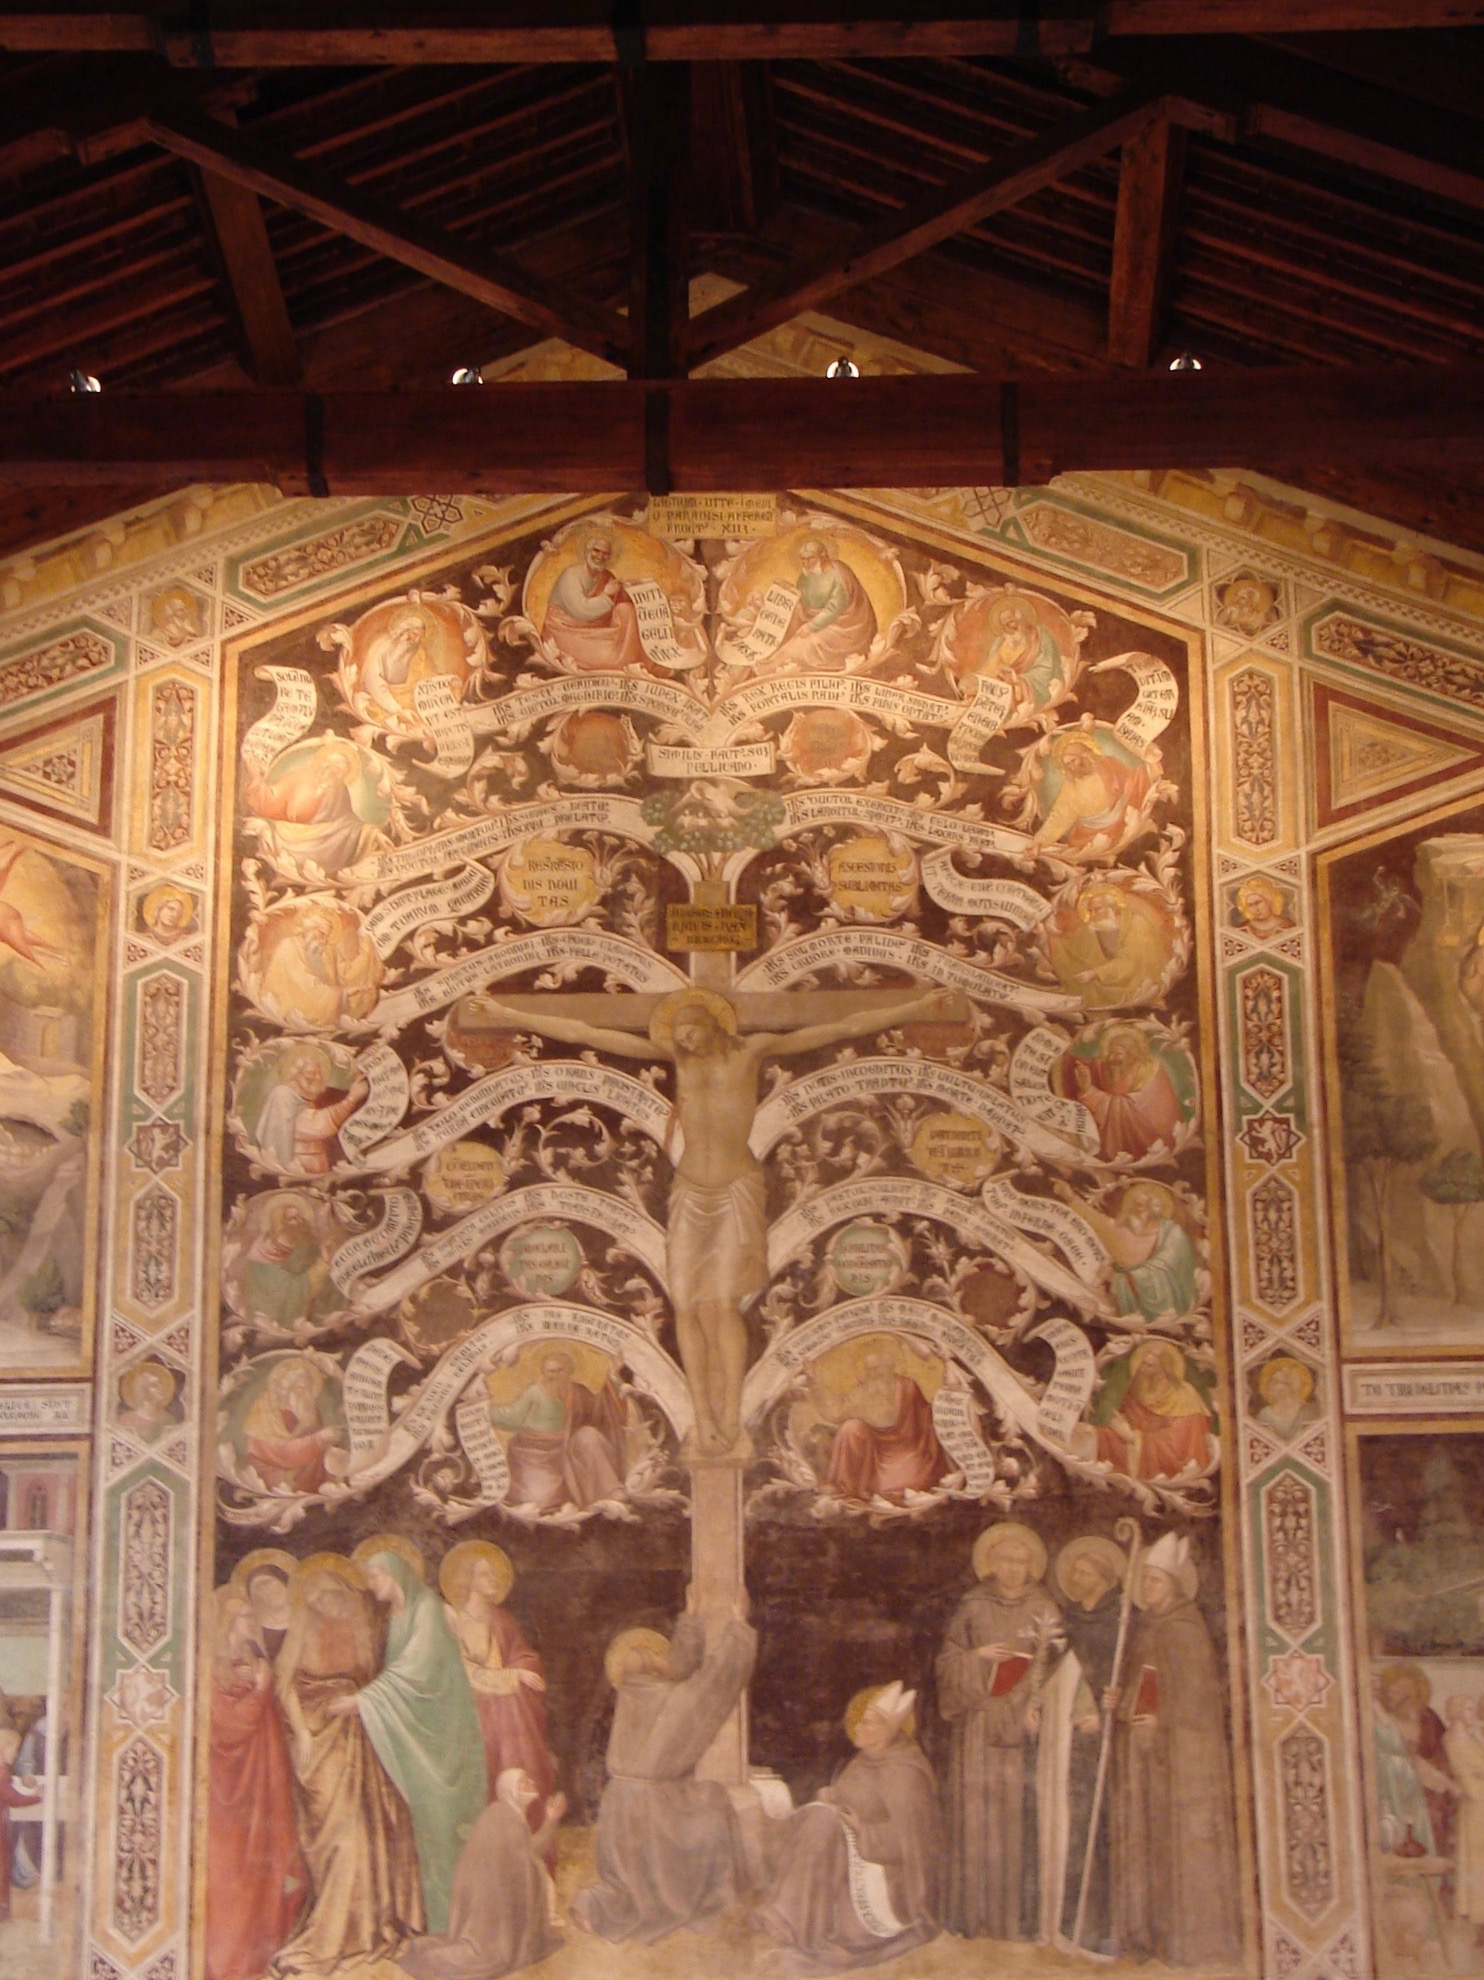 Taddeo Gaddi, Tree of LIfe, refectory of Santa Croce, Florence; photograph courtesy of John Skillen